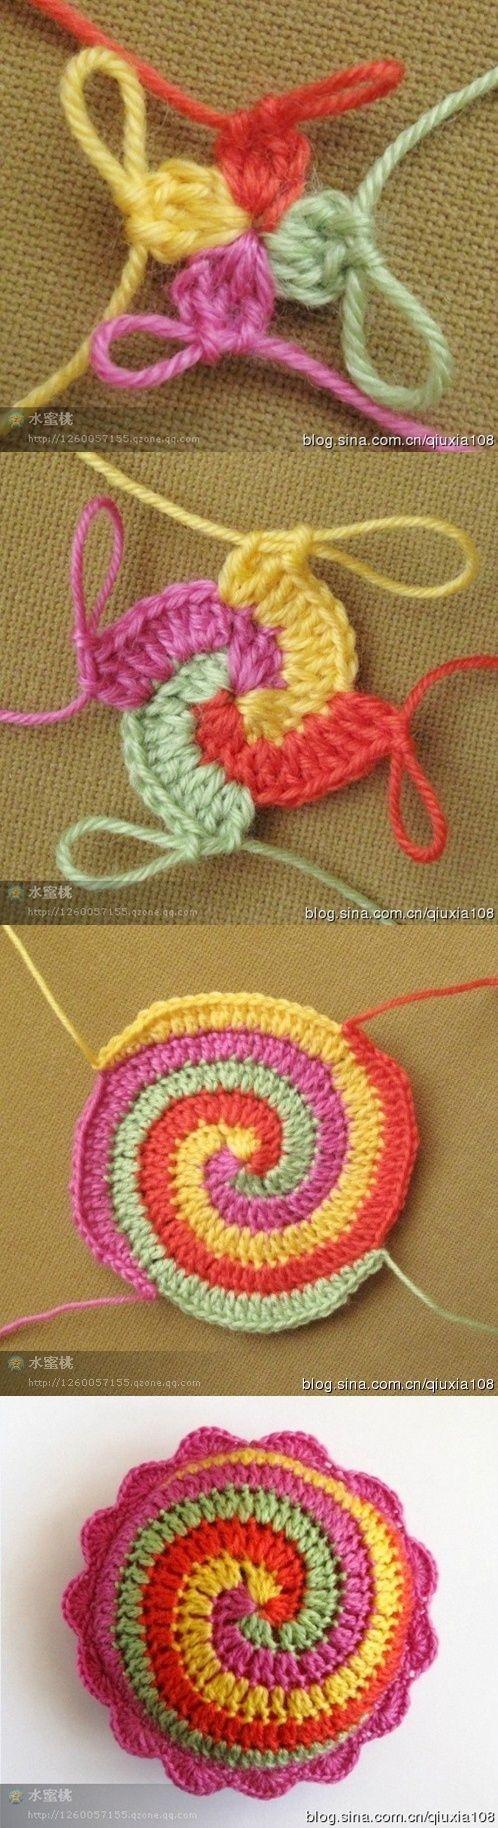 Crochet motif | Crochet | Pinterest | Häkeln, Muster und Handarbeiten